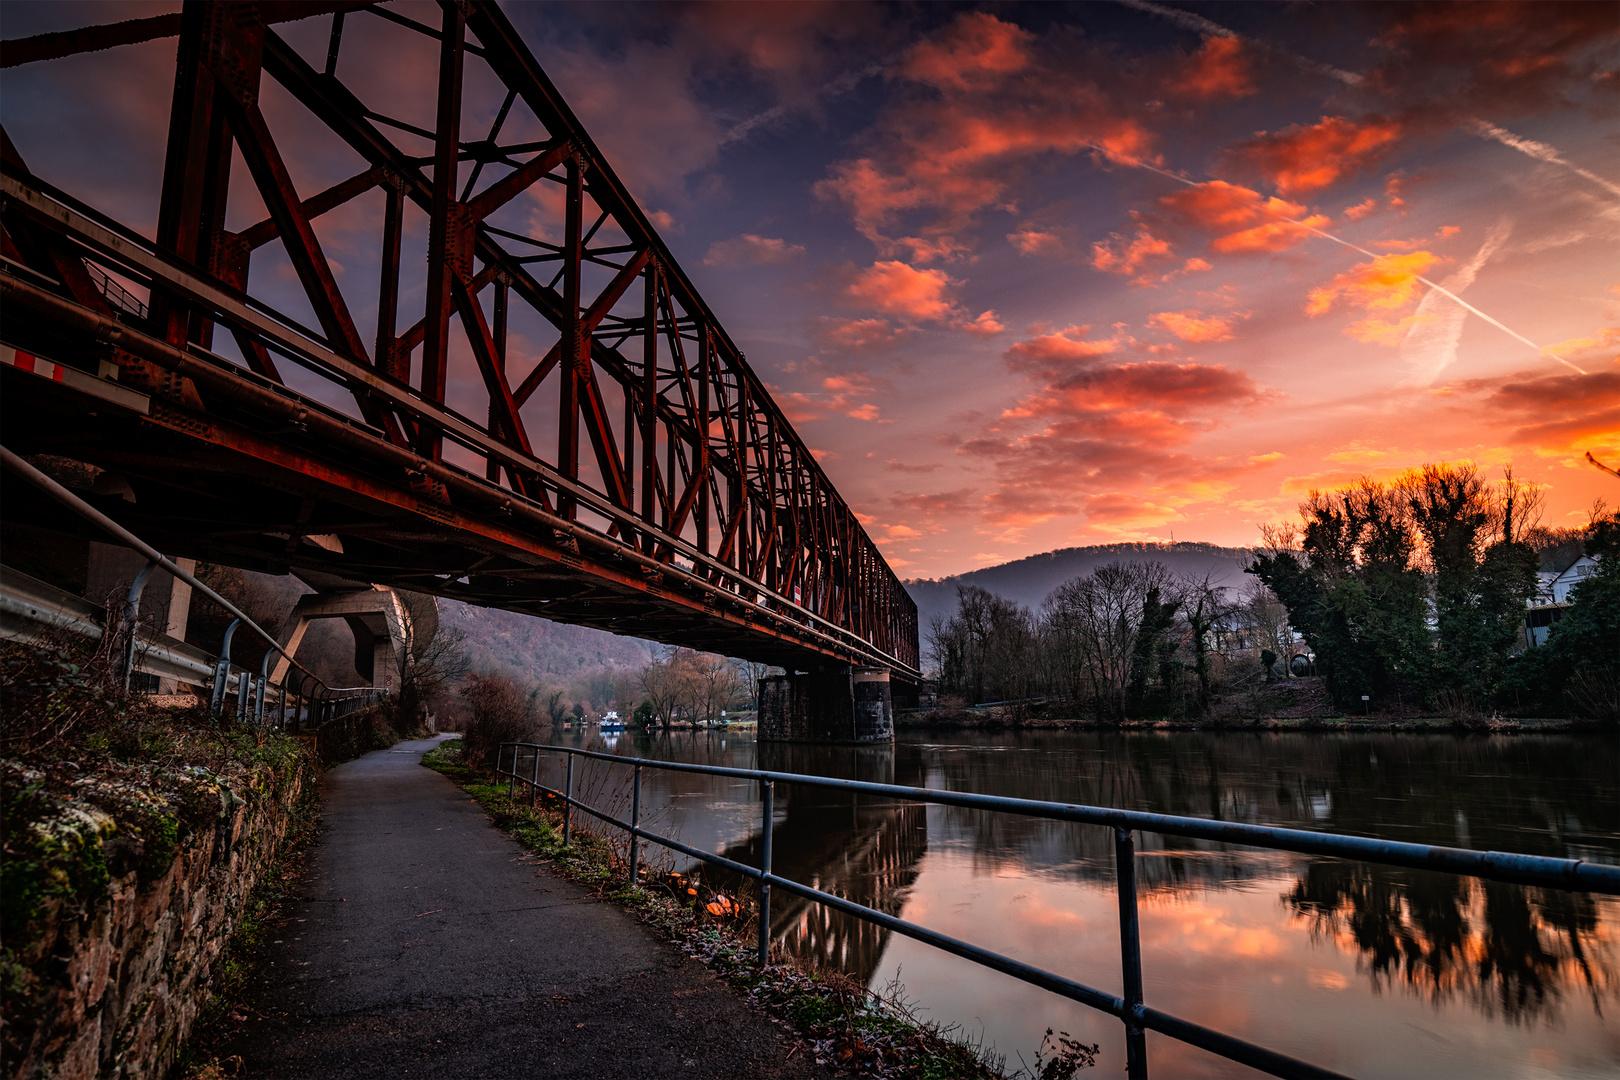 Alte Eisenbahnbrücke im Sonnenaufgang